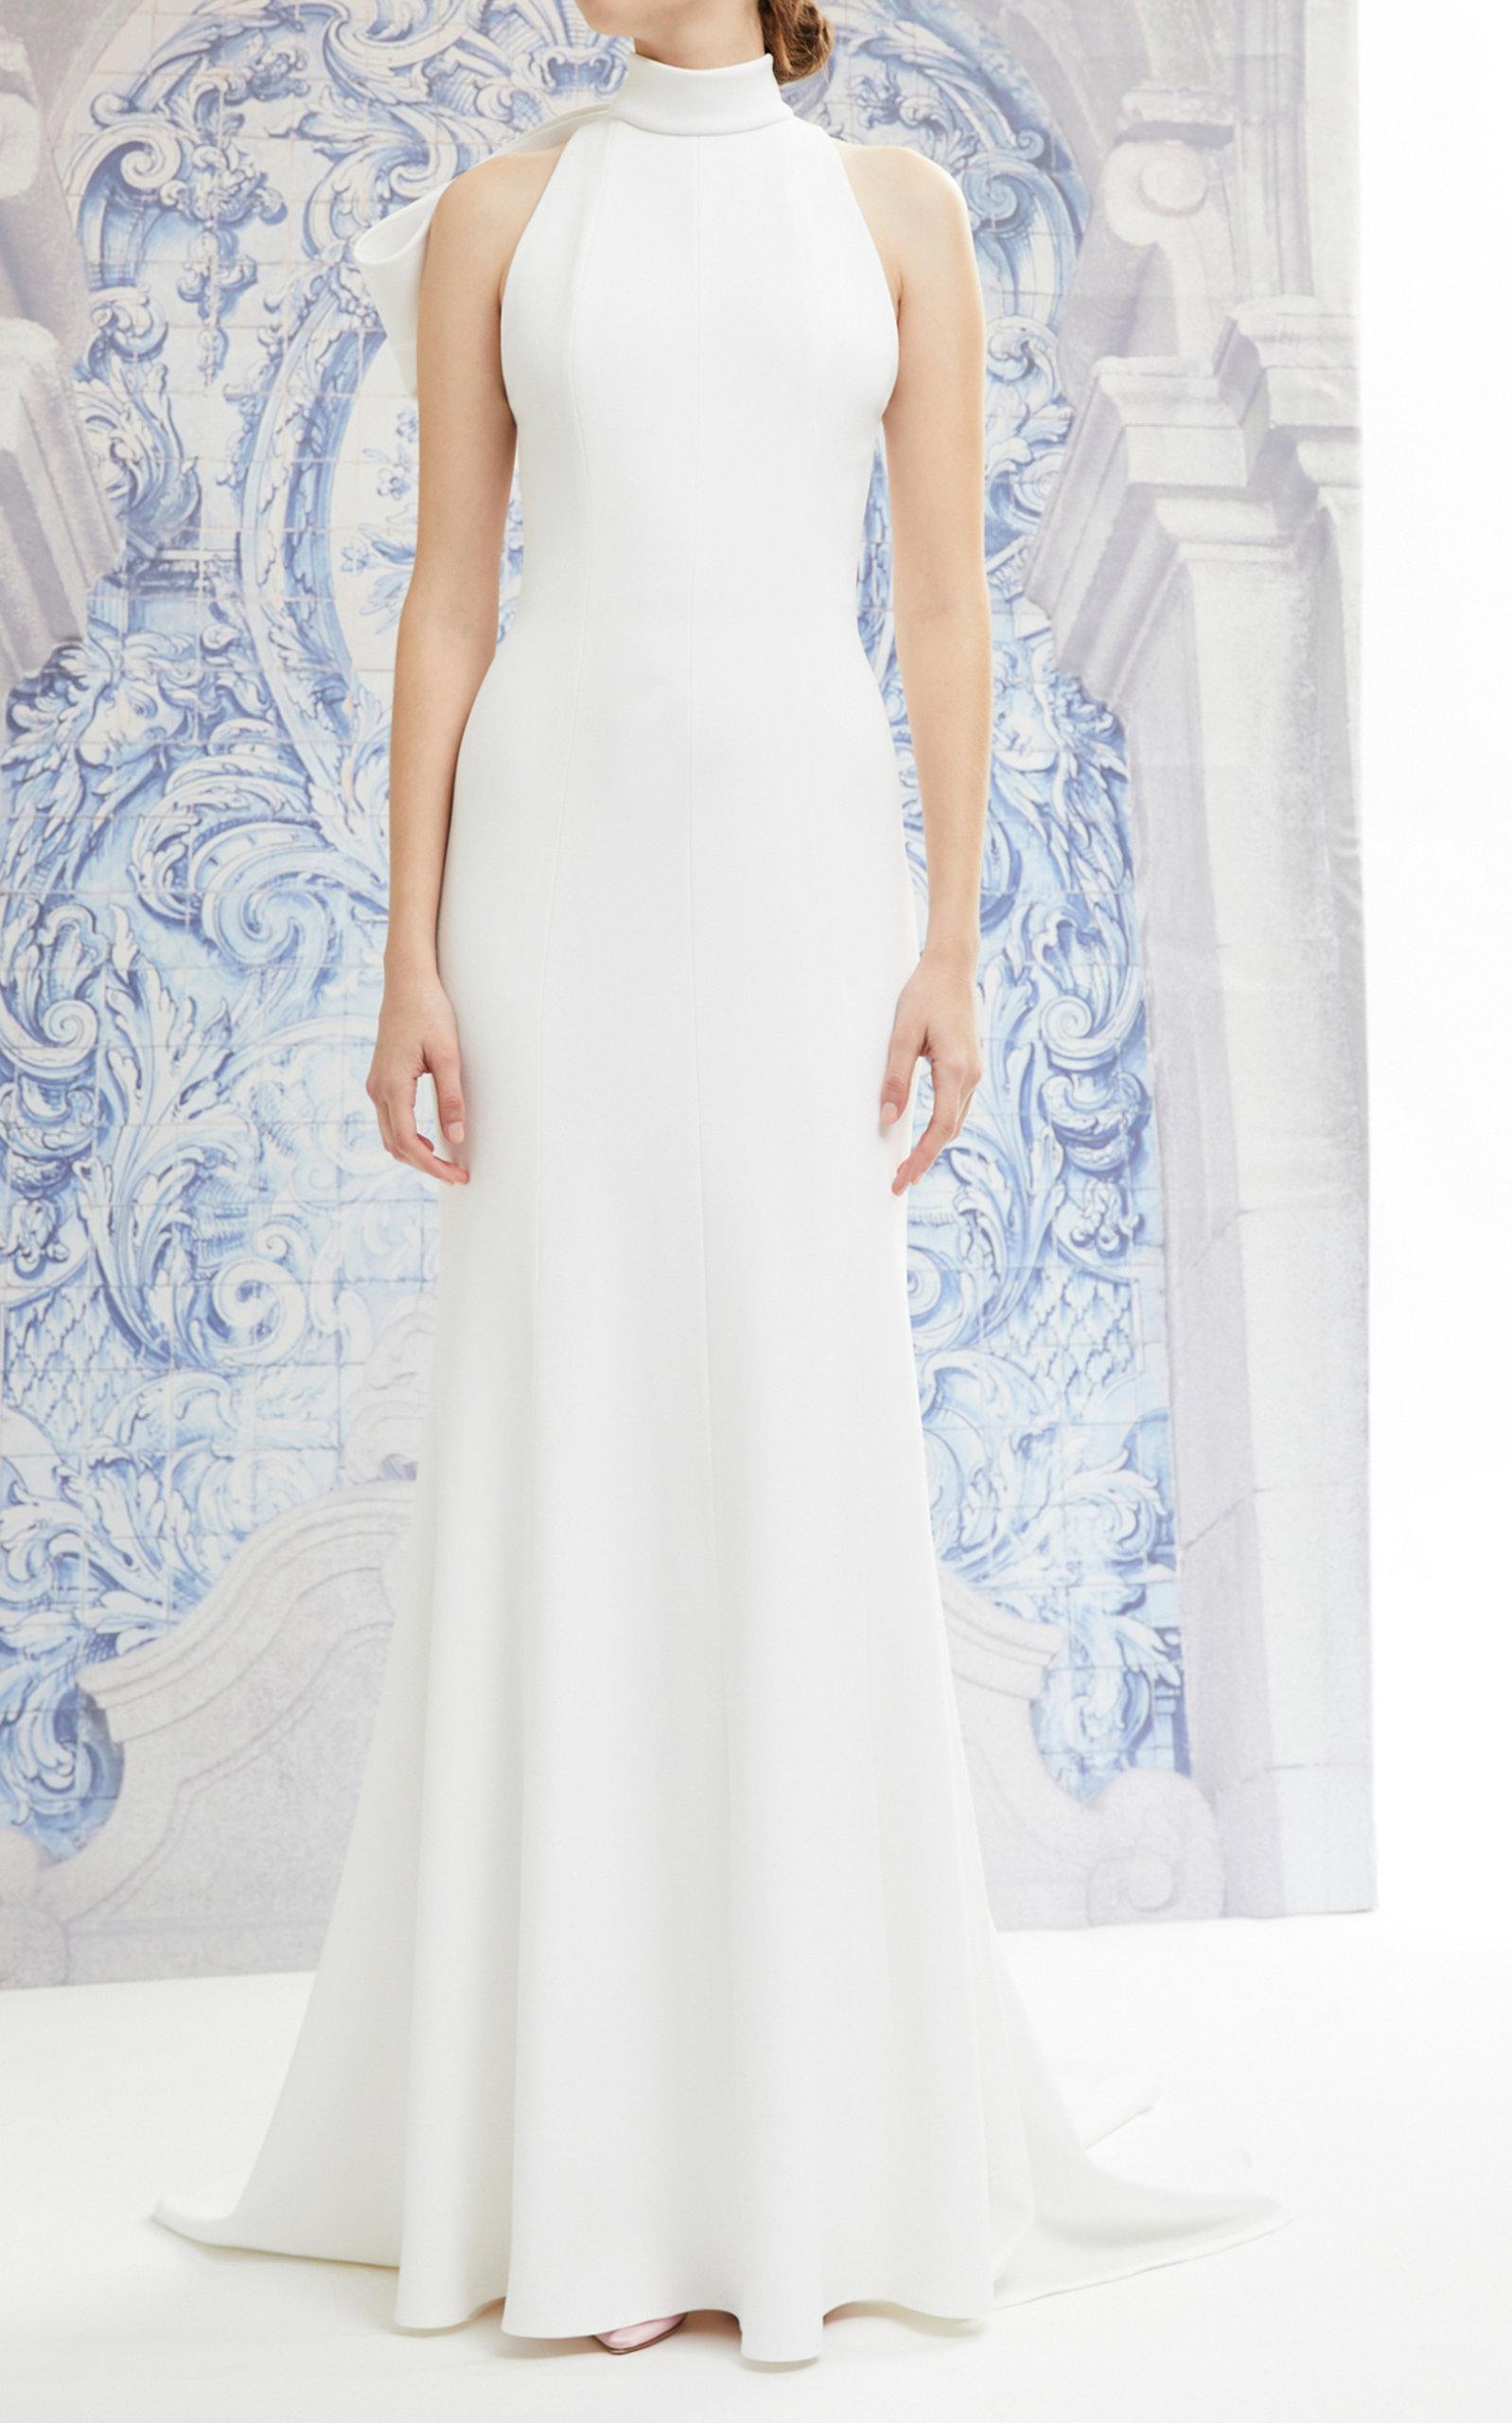 Iris Bow Detailed Crepe Halterneck Gown By Carolina Herrera Bridal Moda Operandi,Badgley Mischka Wedding Dress